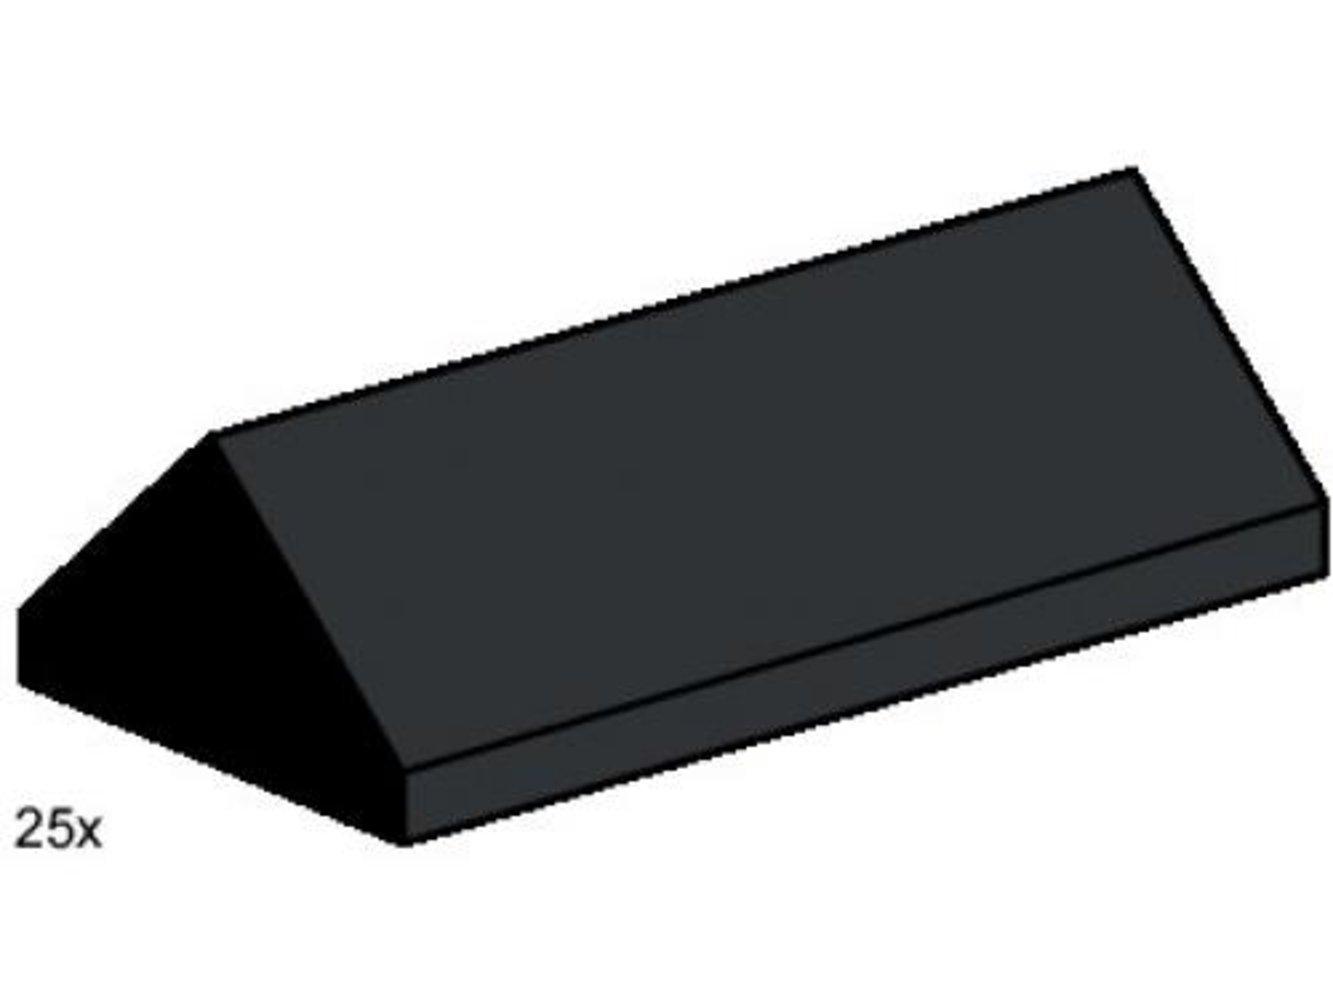 2 x 4 Ridge Roof Tiles Steep Sloped Black